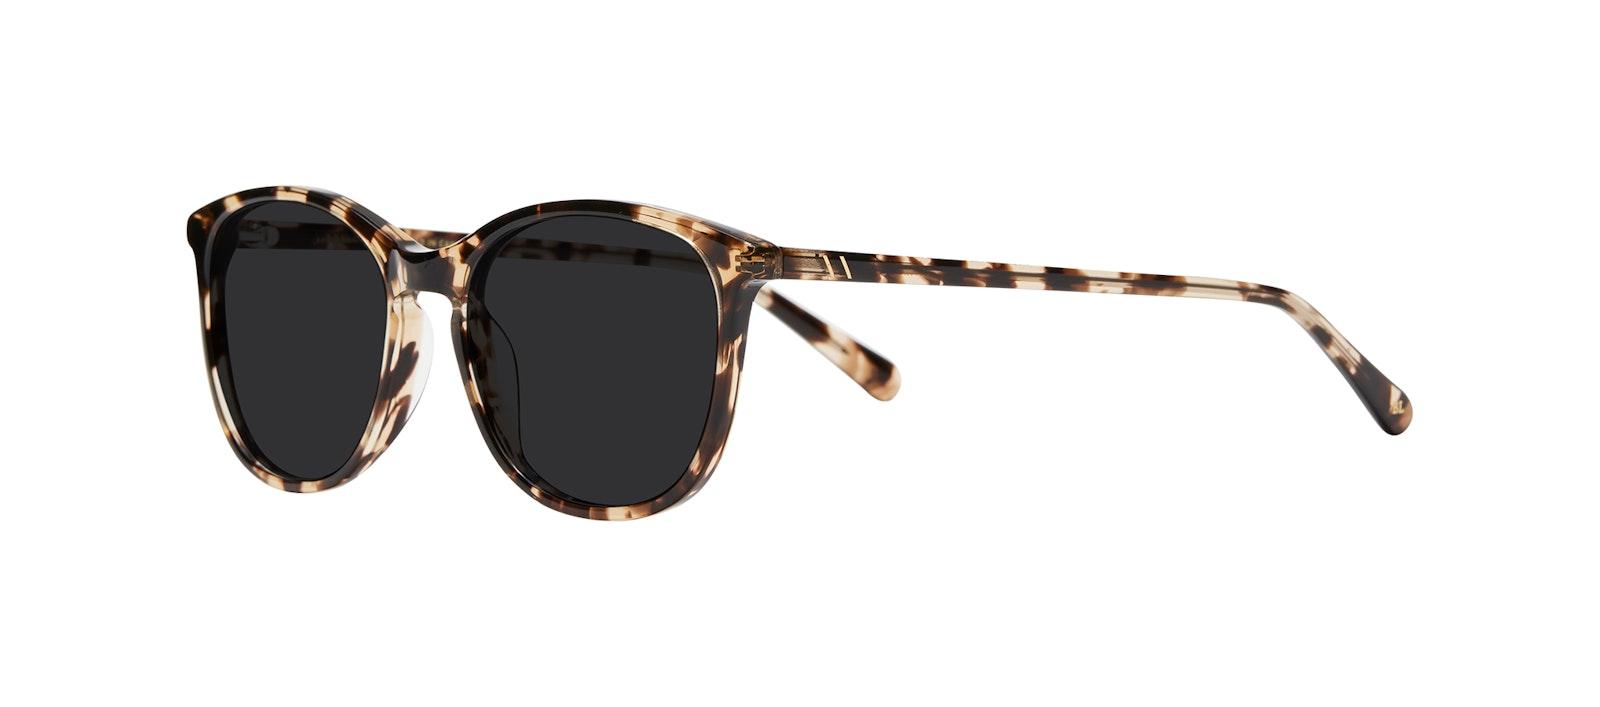 Affordable Fashion Glasses Rectangle Square Round Sunglasses Women Nadine M Snake Skin Tilt